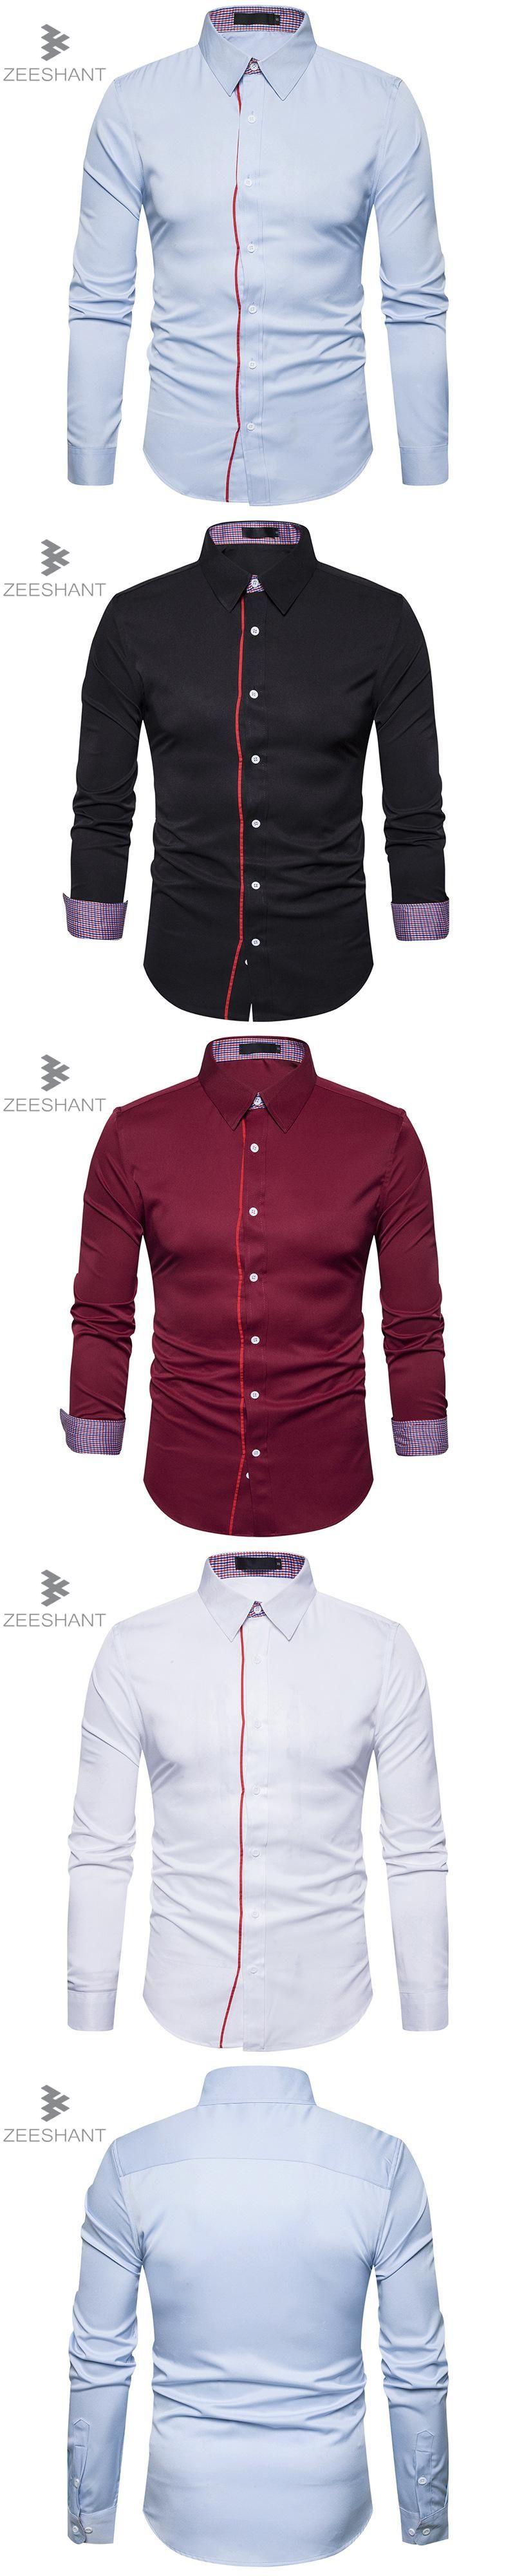 Wedding dress shirts for men  Zeeshant Menus Luxury Shirts Wedding Party Dress Long Sleeve Shirt